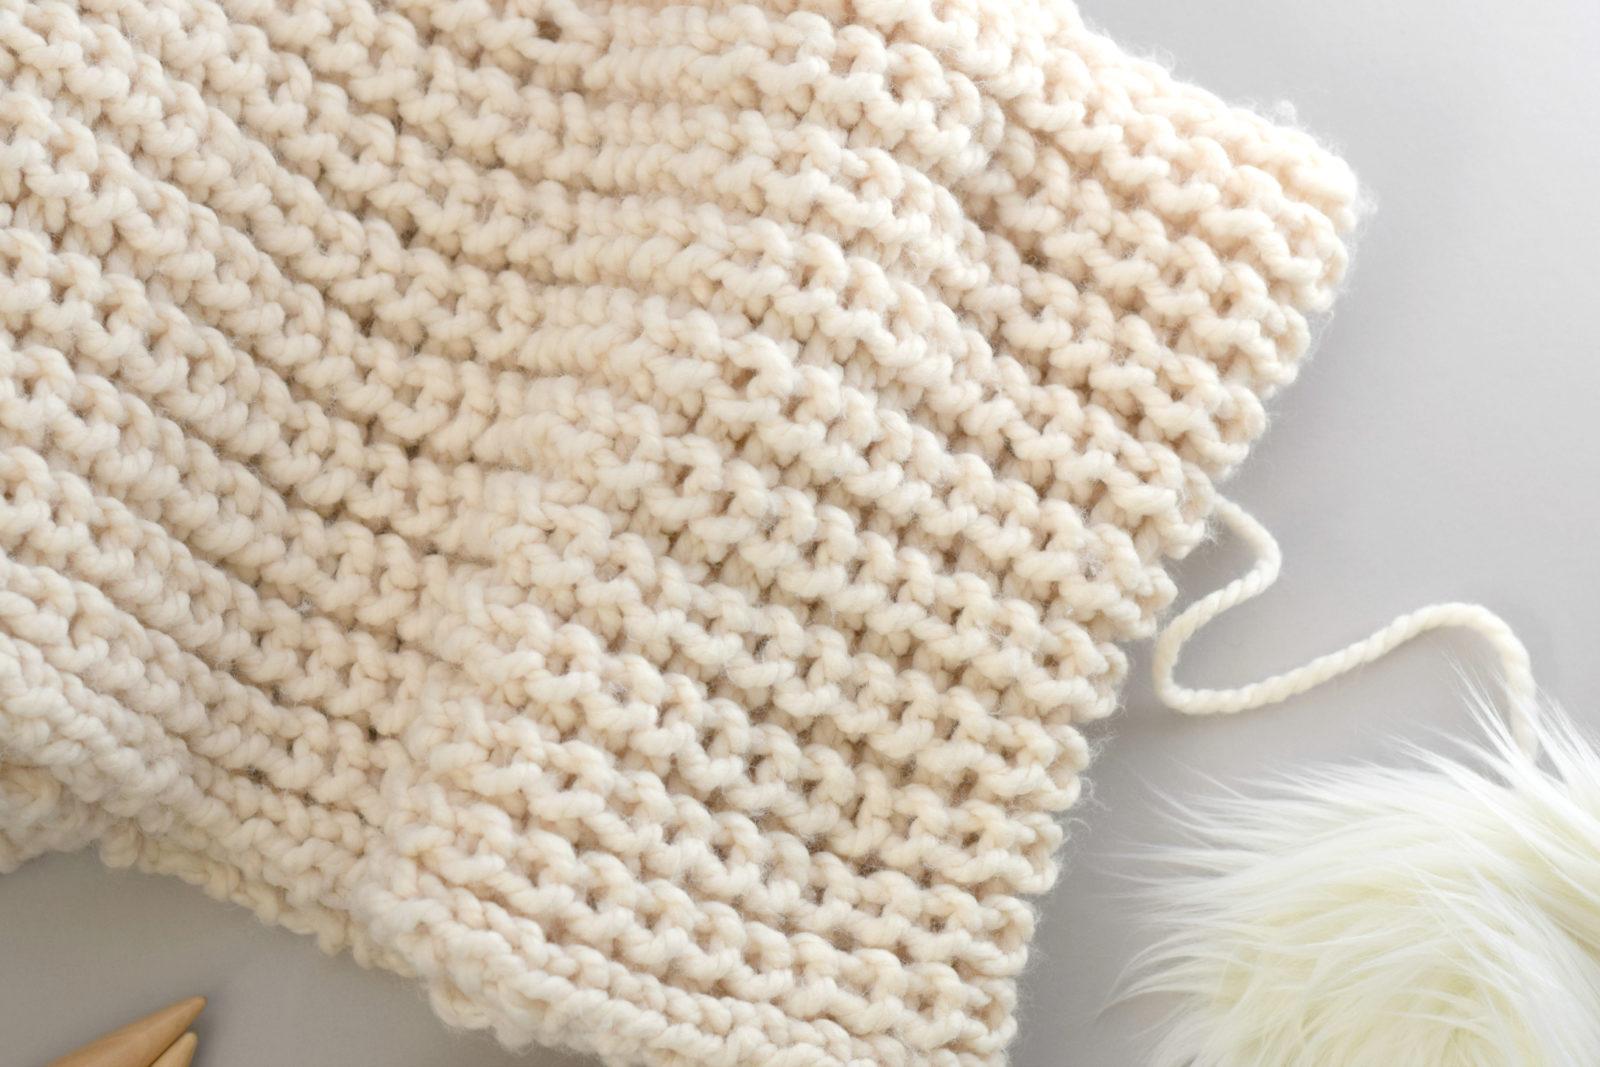 How To Knit Half Fisherman Rib Stitch Mama In A Stitch